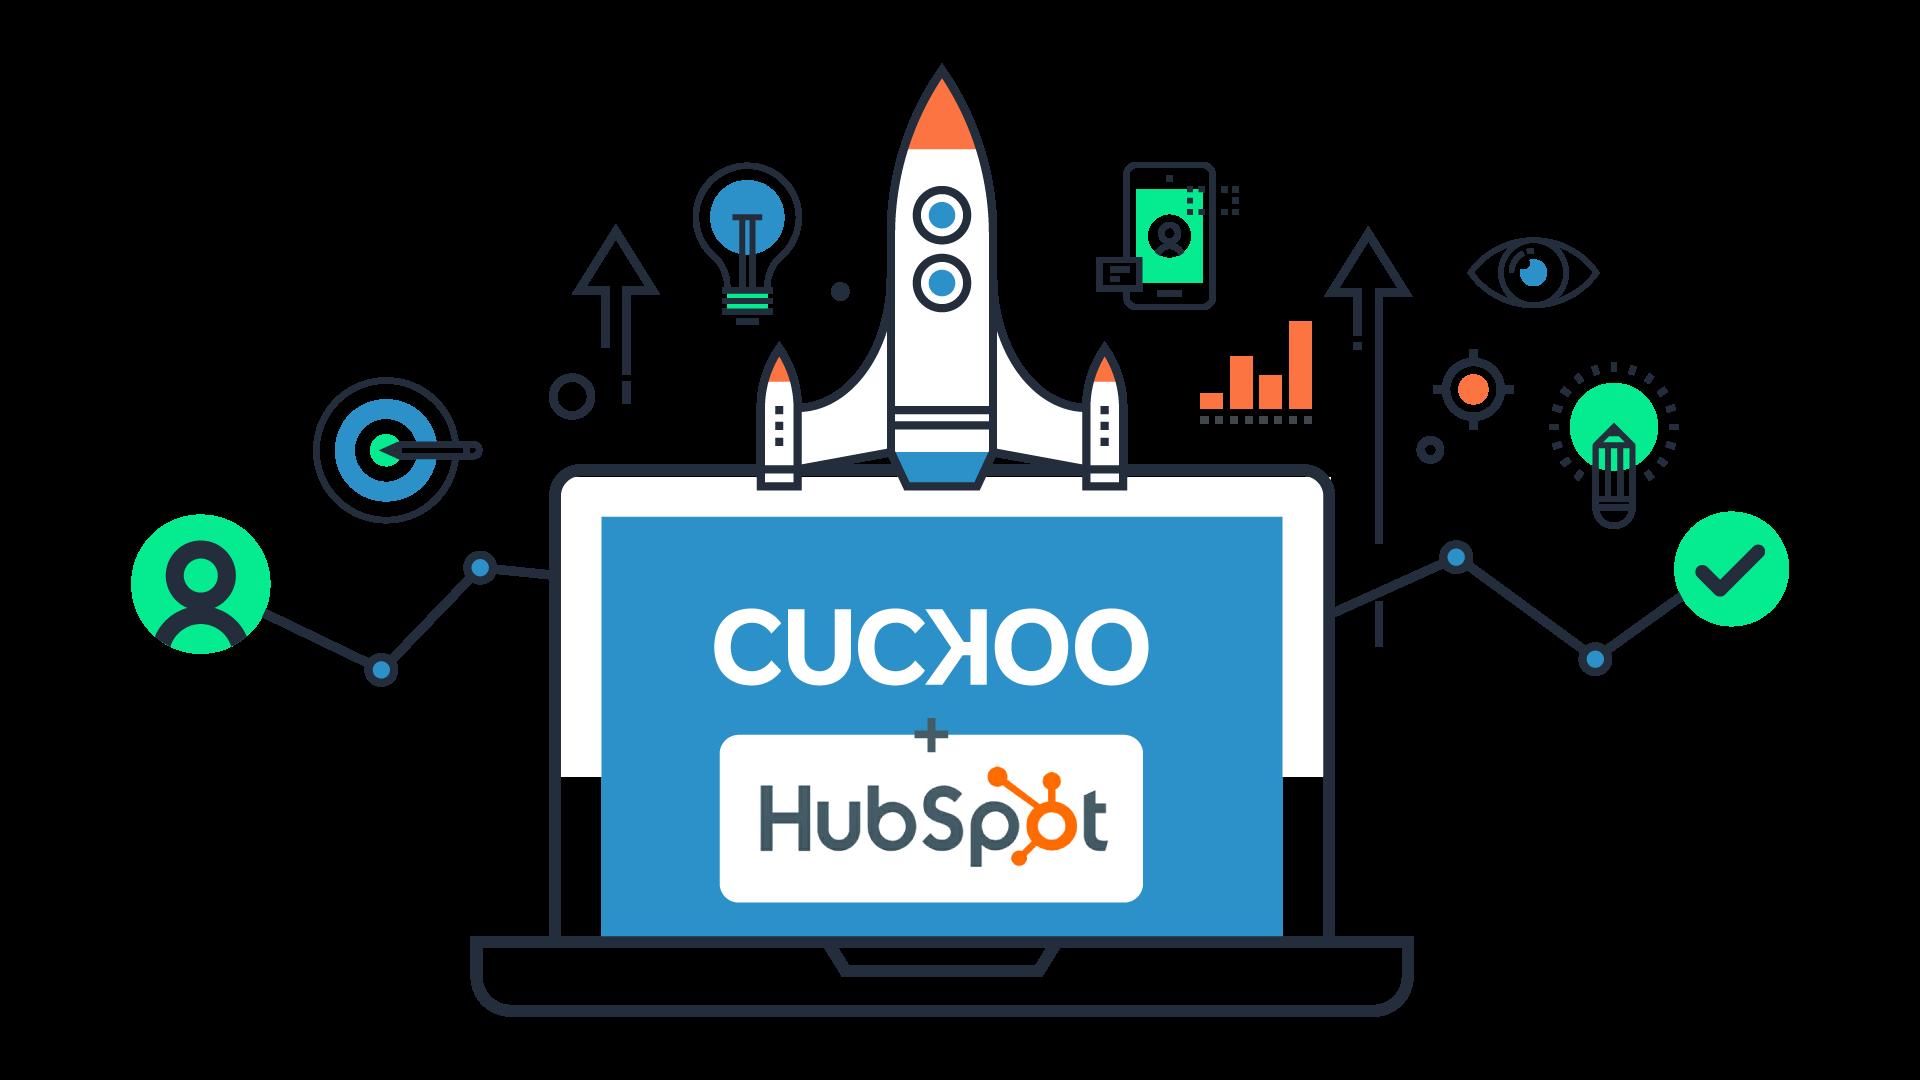 cuckoo+hubspot